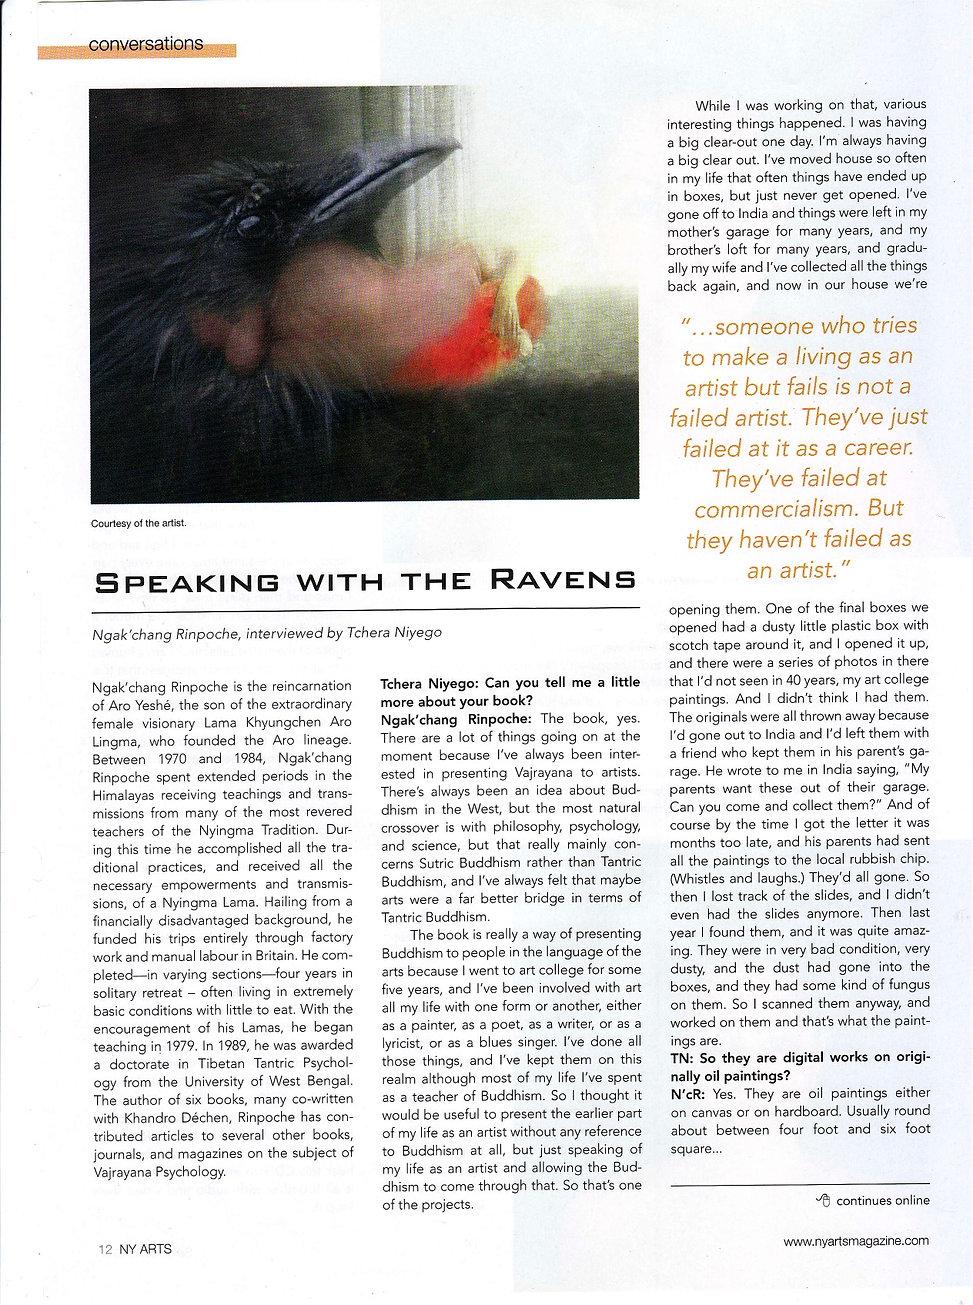 Speaking with Ravens NY Arts.jpg